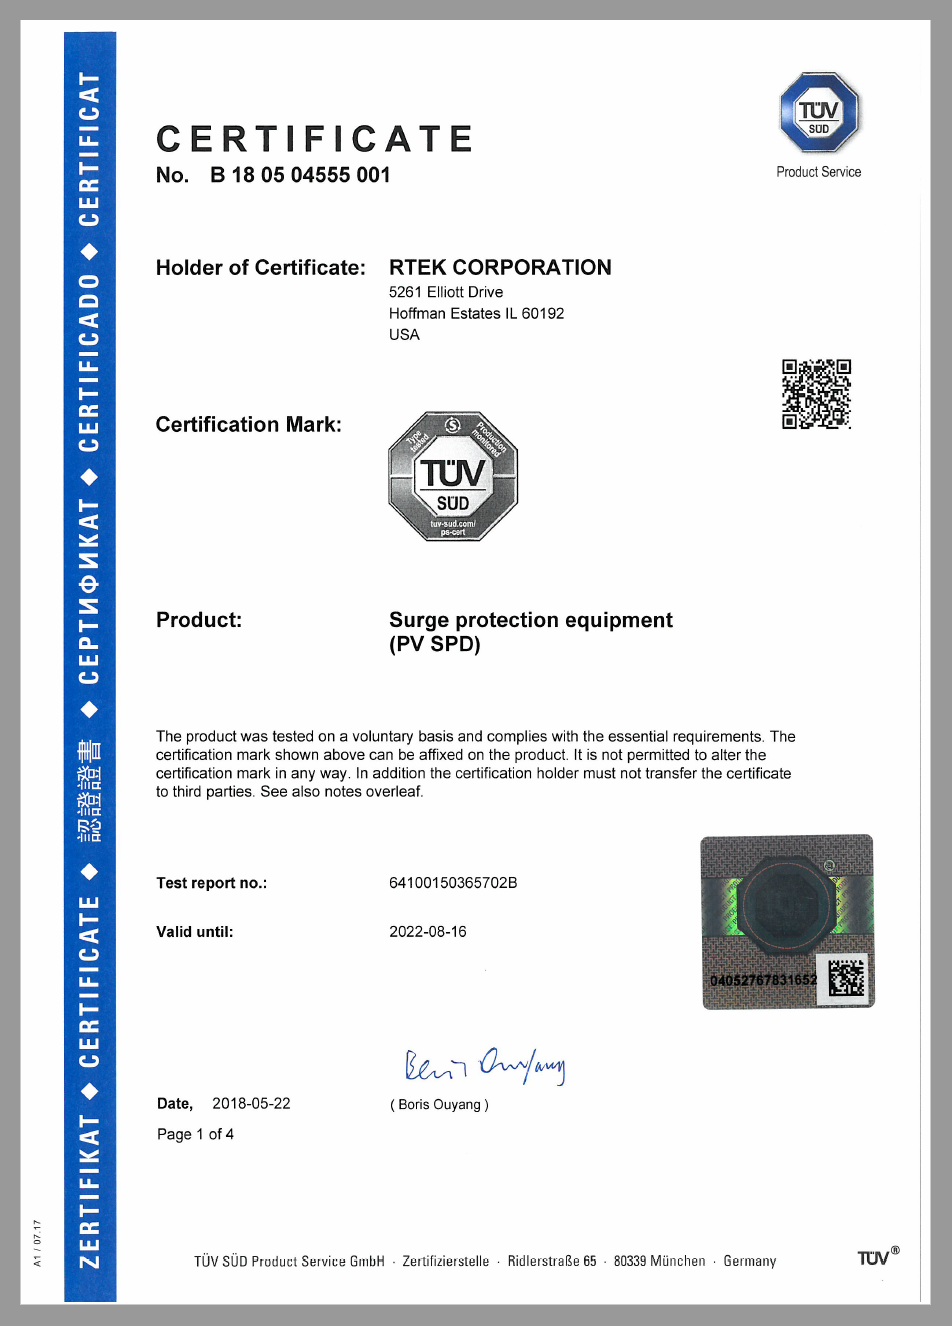 RTEK SPD,Surge protective device manufacturers,Lightning device TUV certification